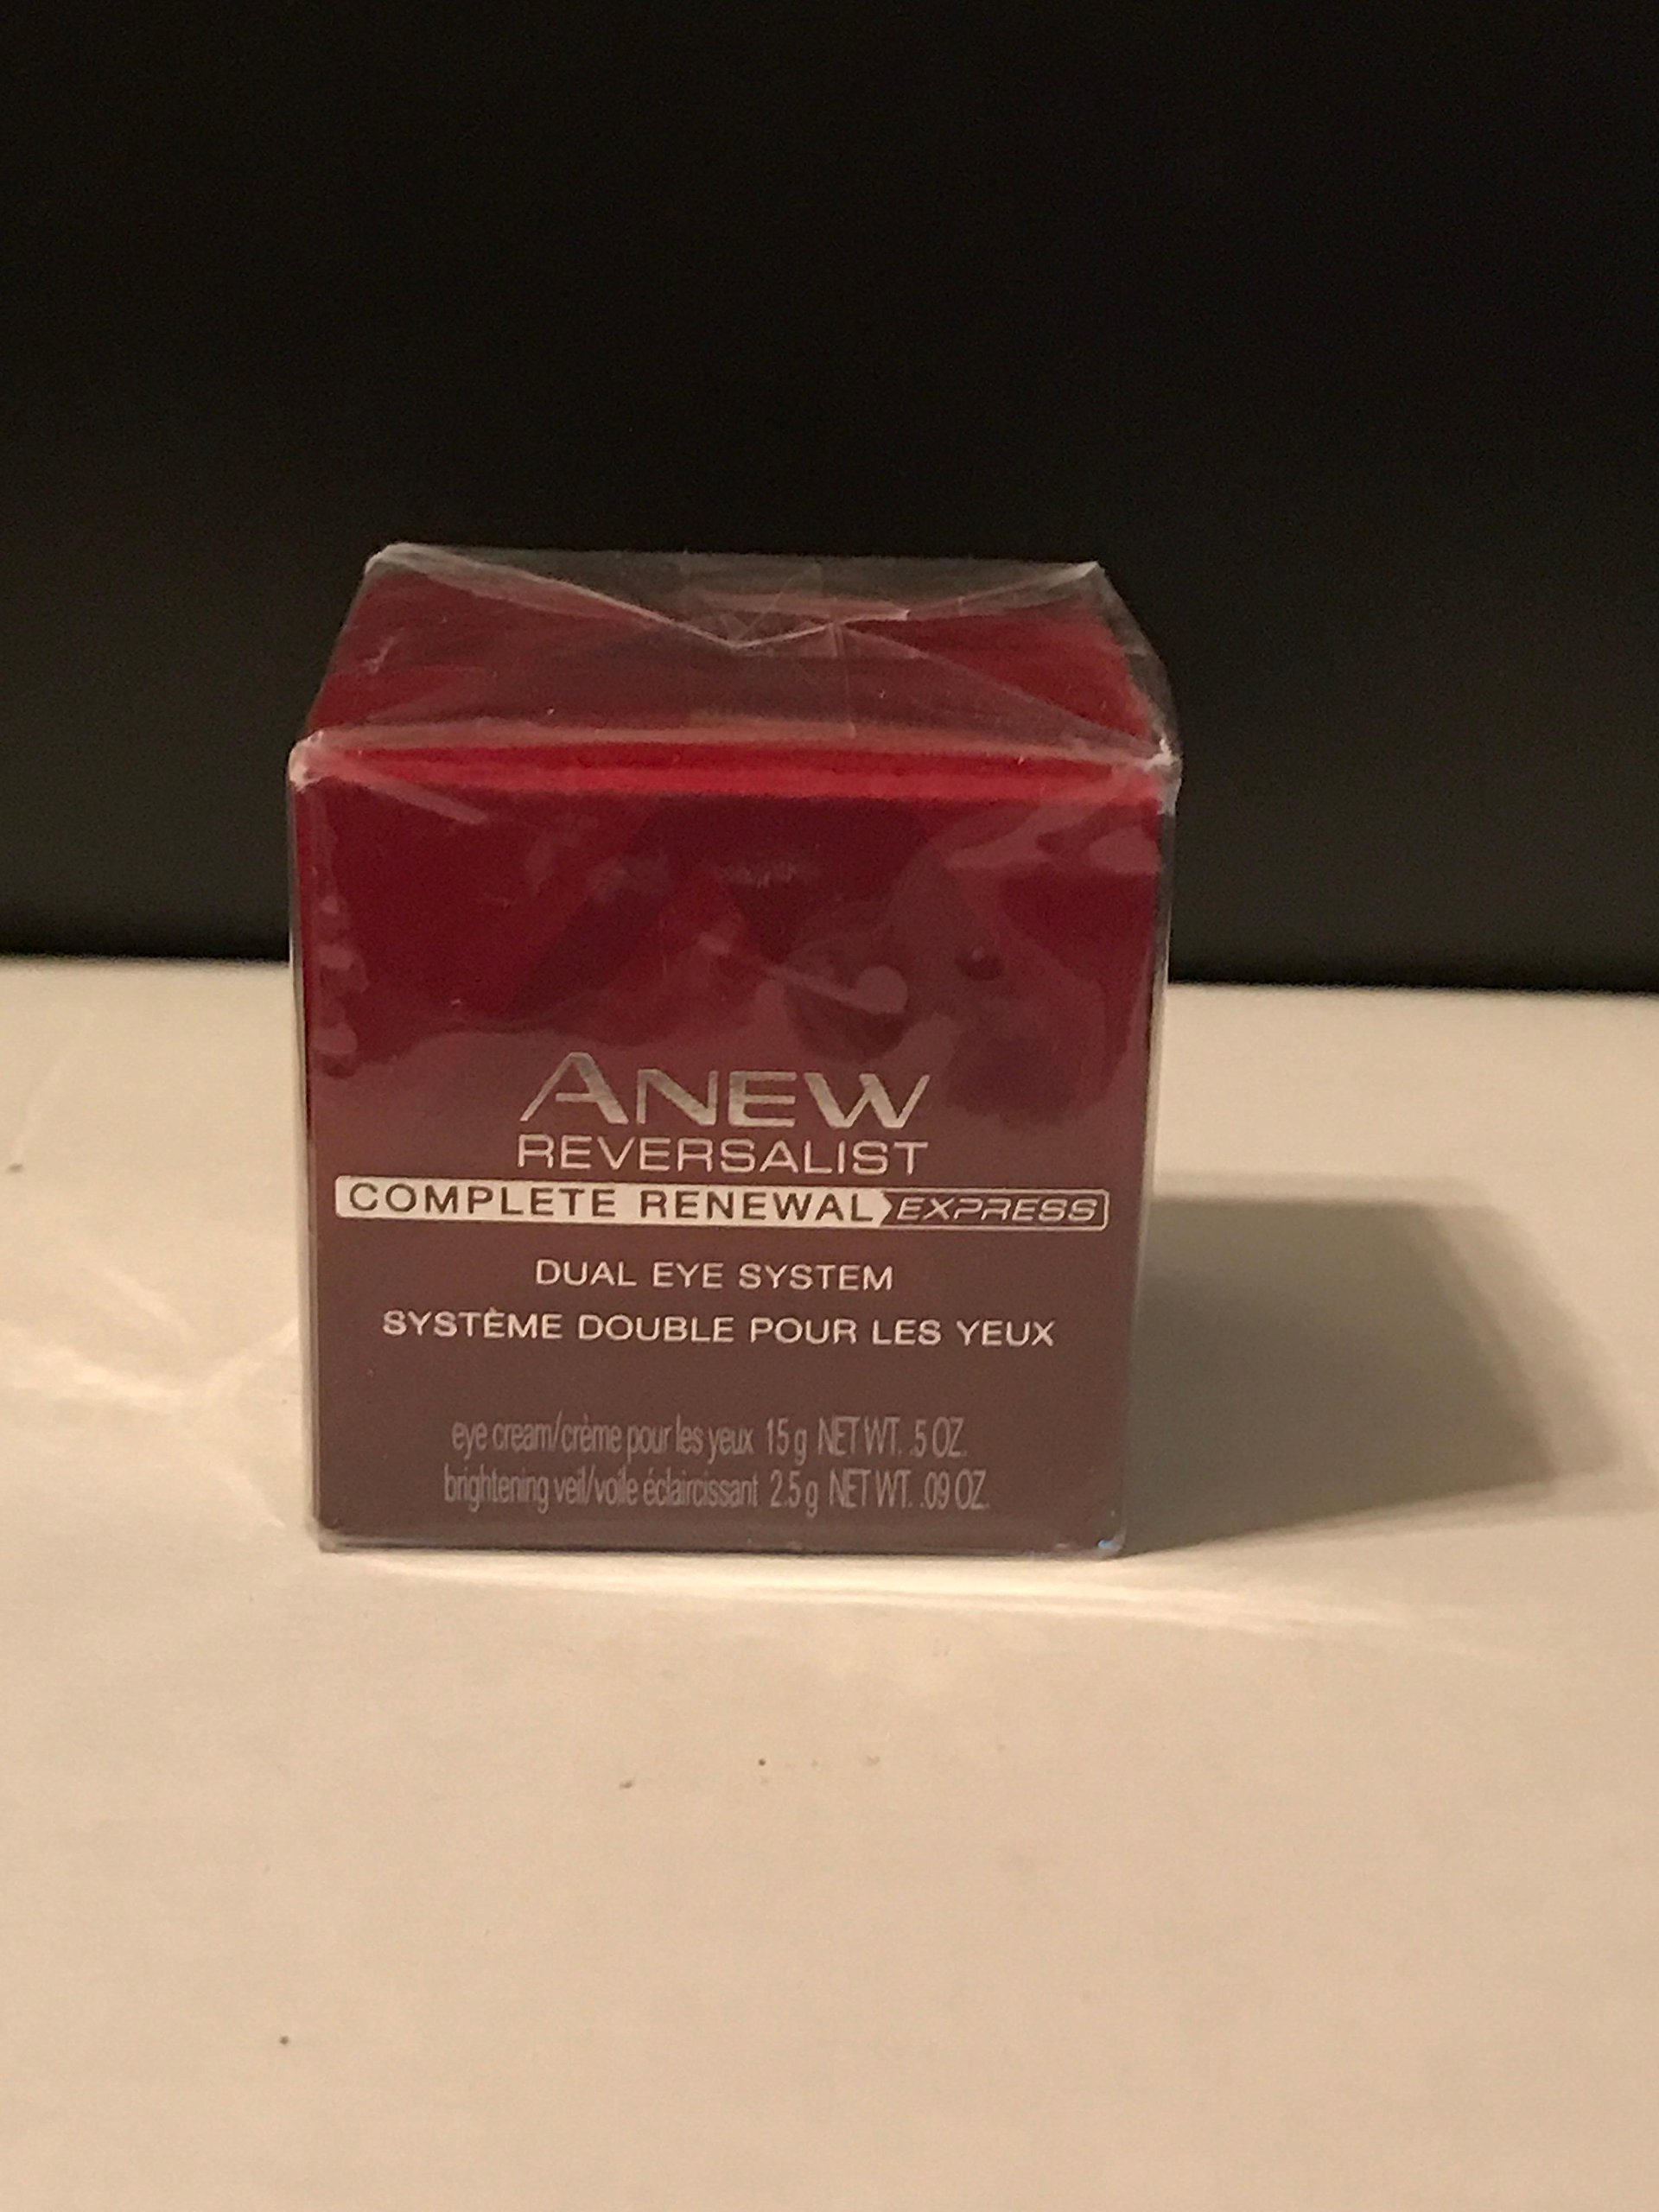 Avon Anew Reversalist Complete Renewal Express Dual Eye System